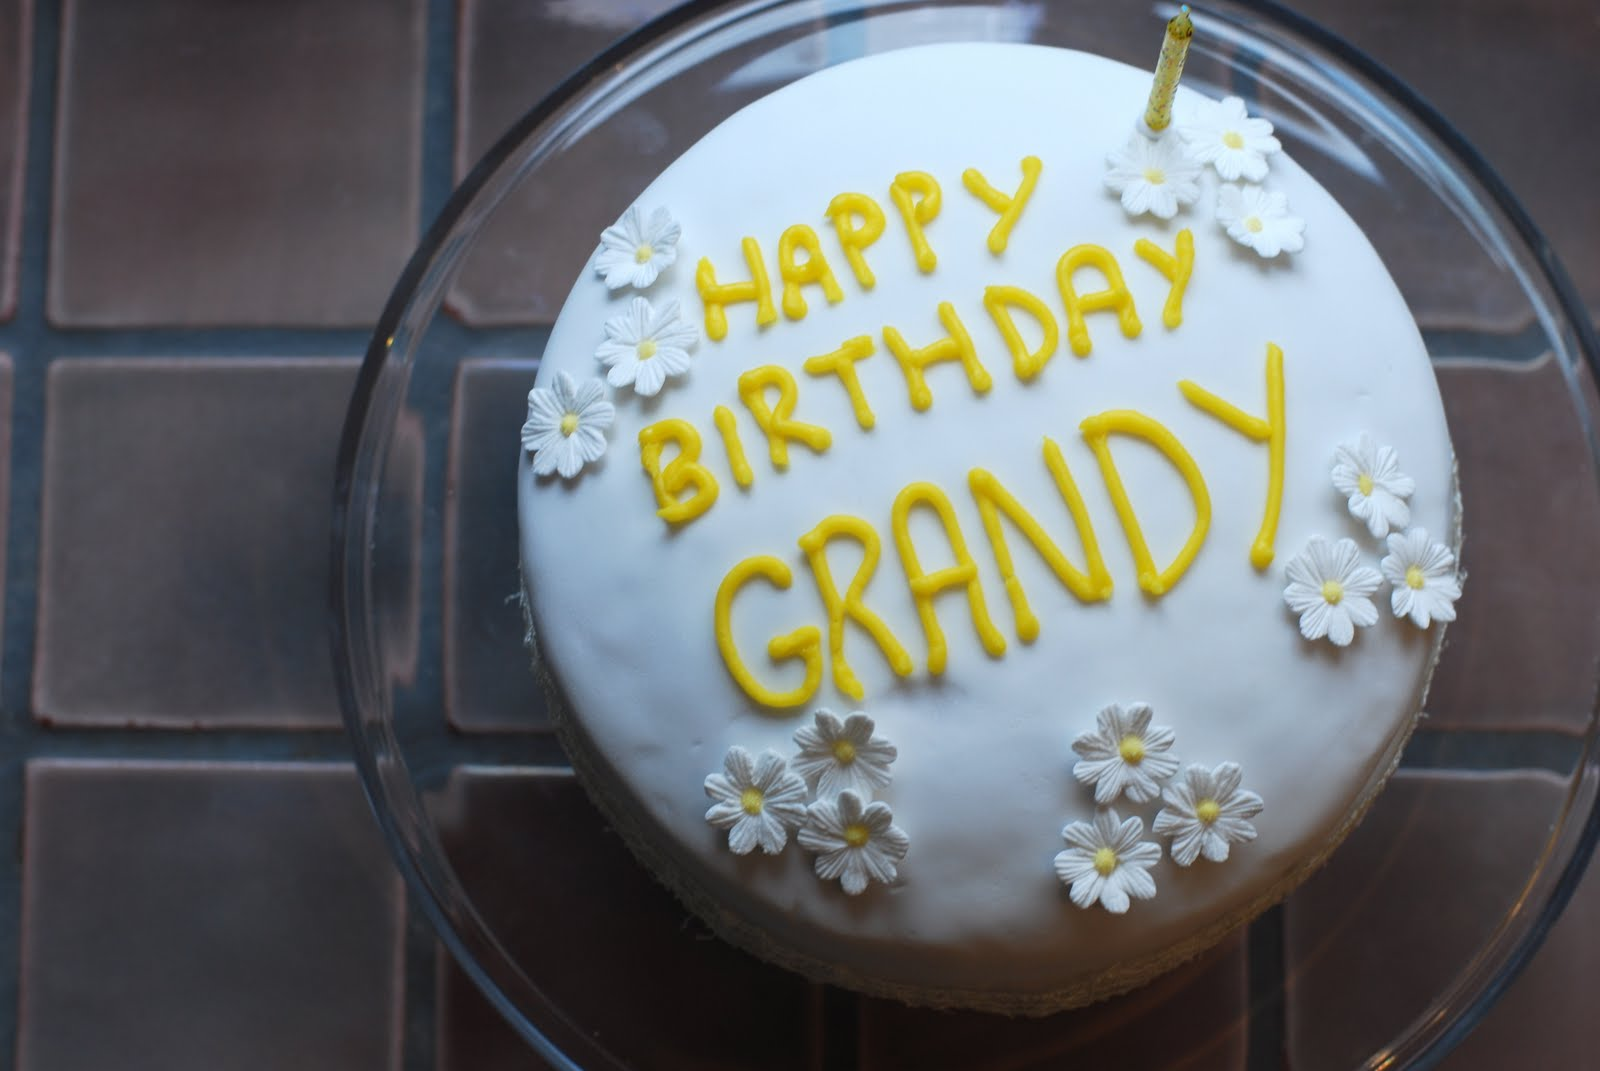 Afternoon Crumbs Happy Birthday Grandy